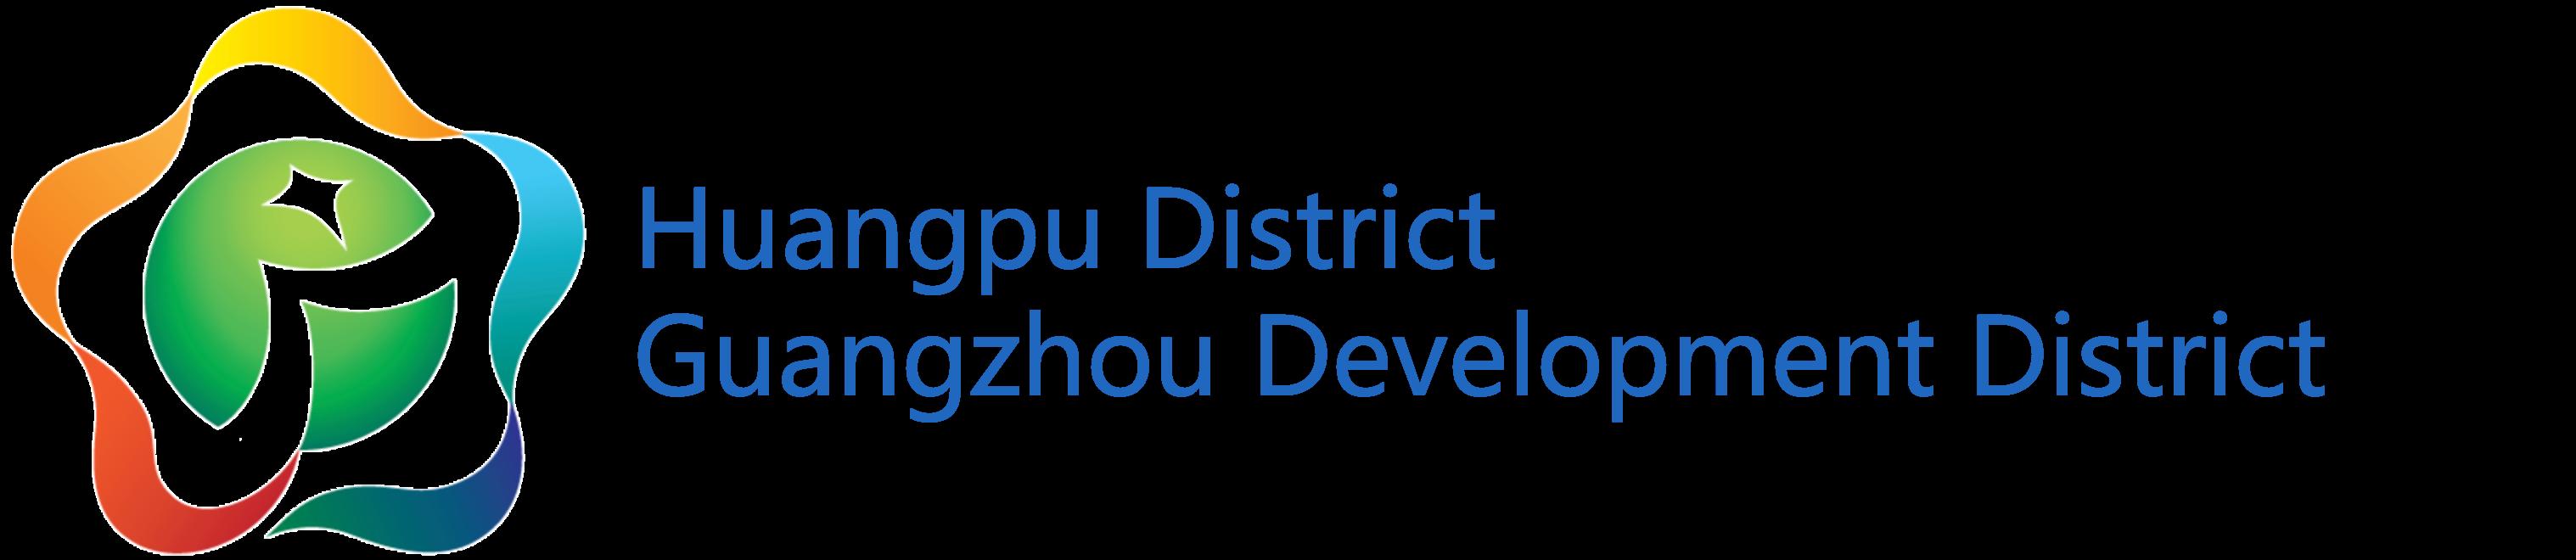 Huangpu District  - Guangzhou Development District